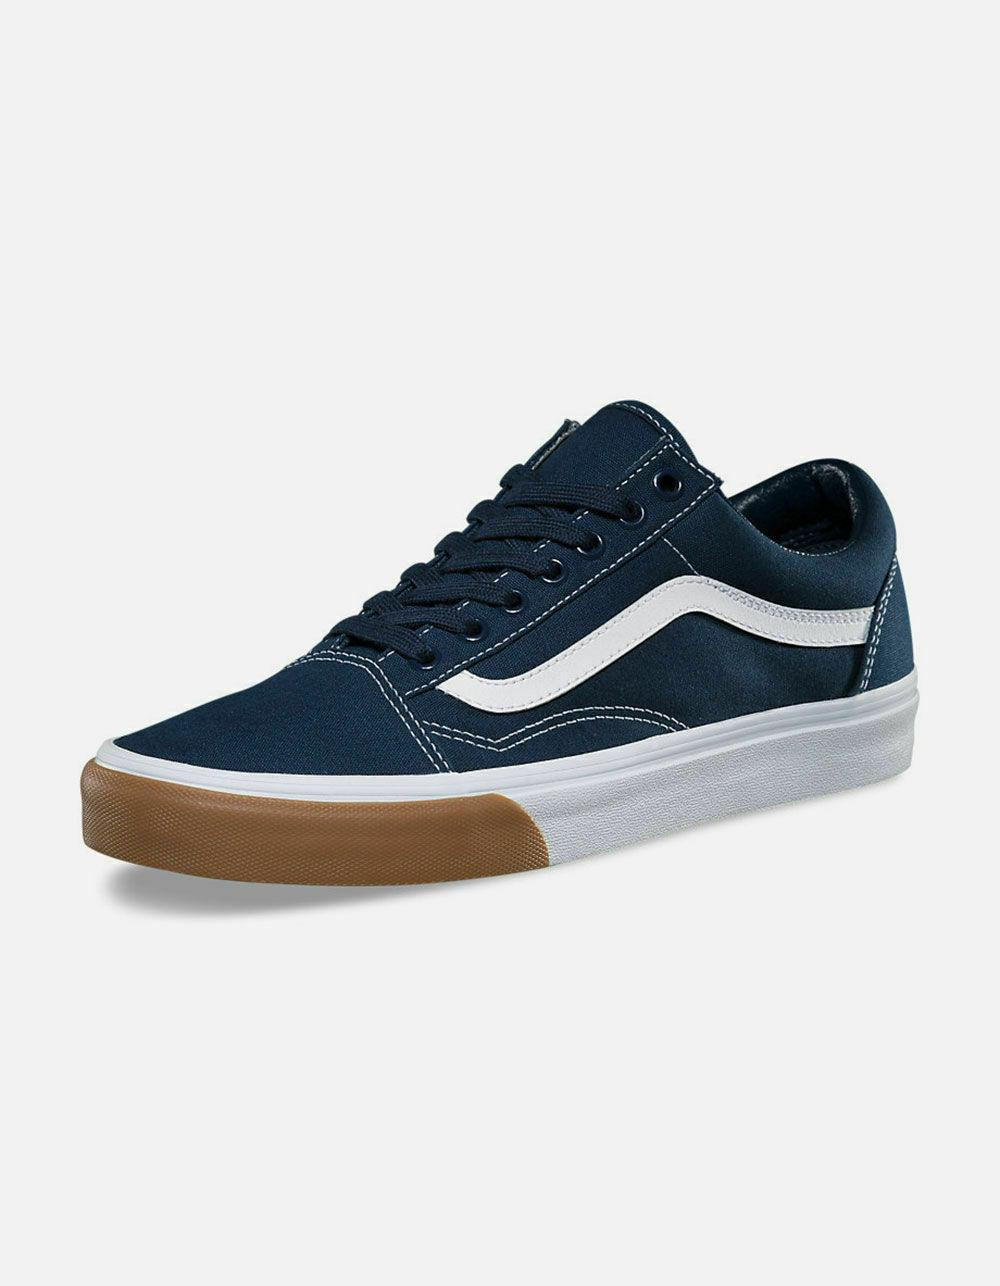 Mens Old Skool Skate Shoes Bumper Dress Blues Navy White